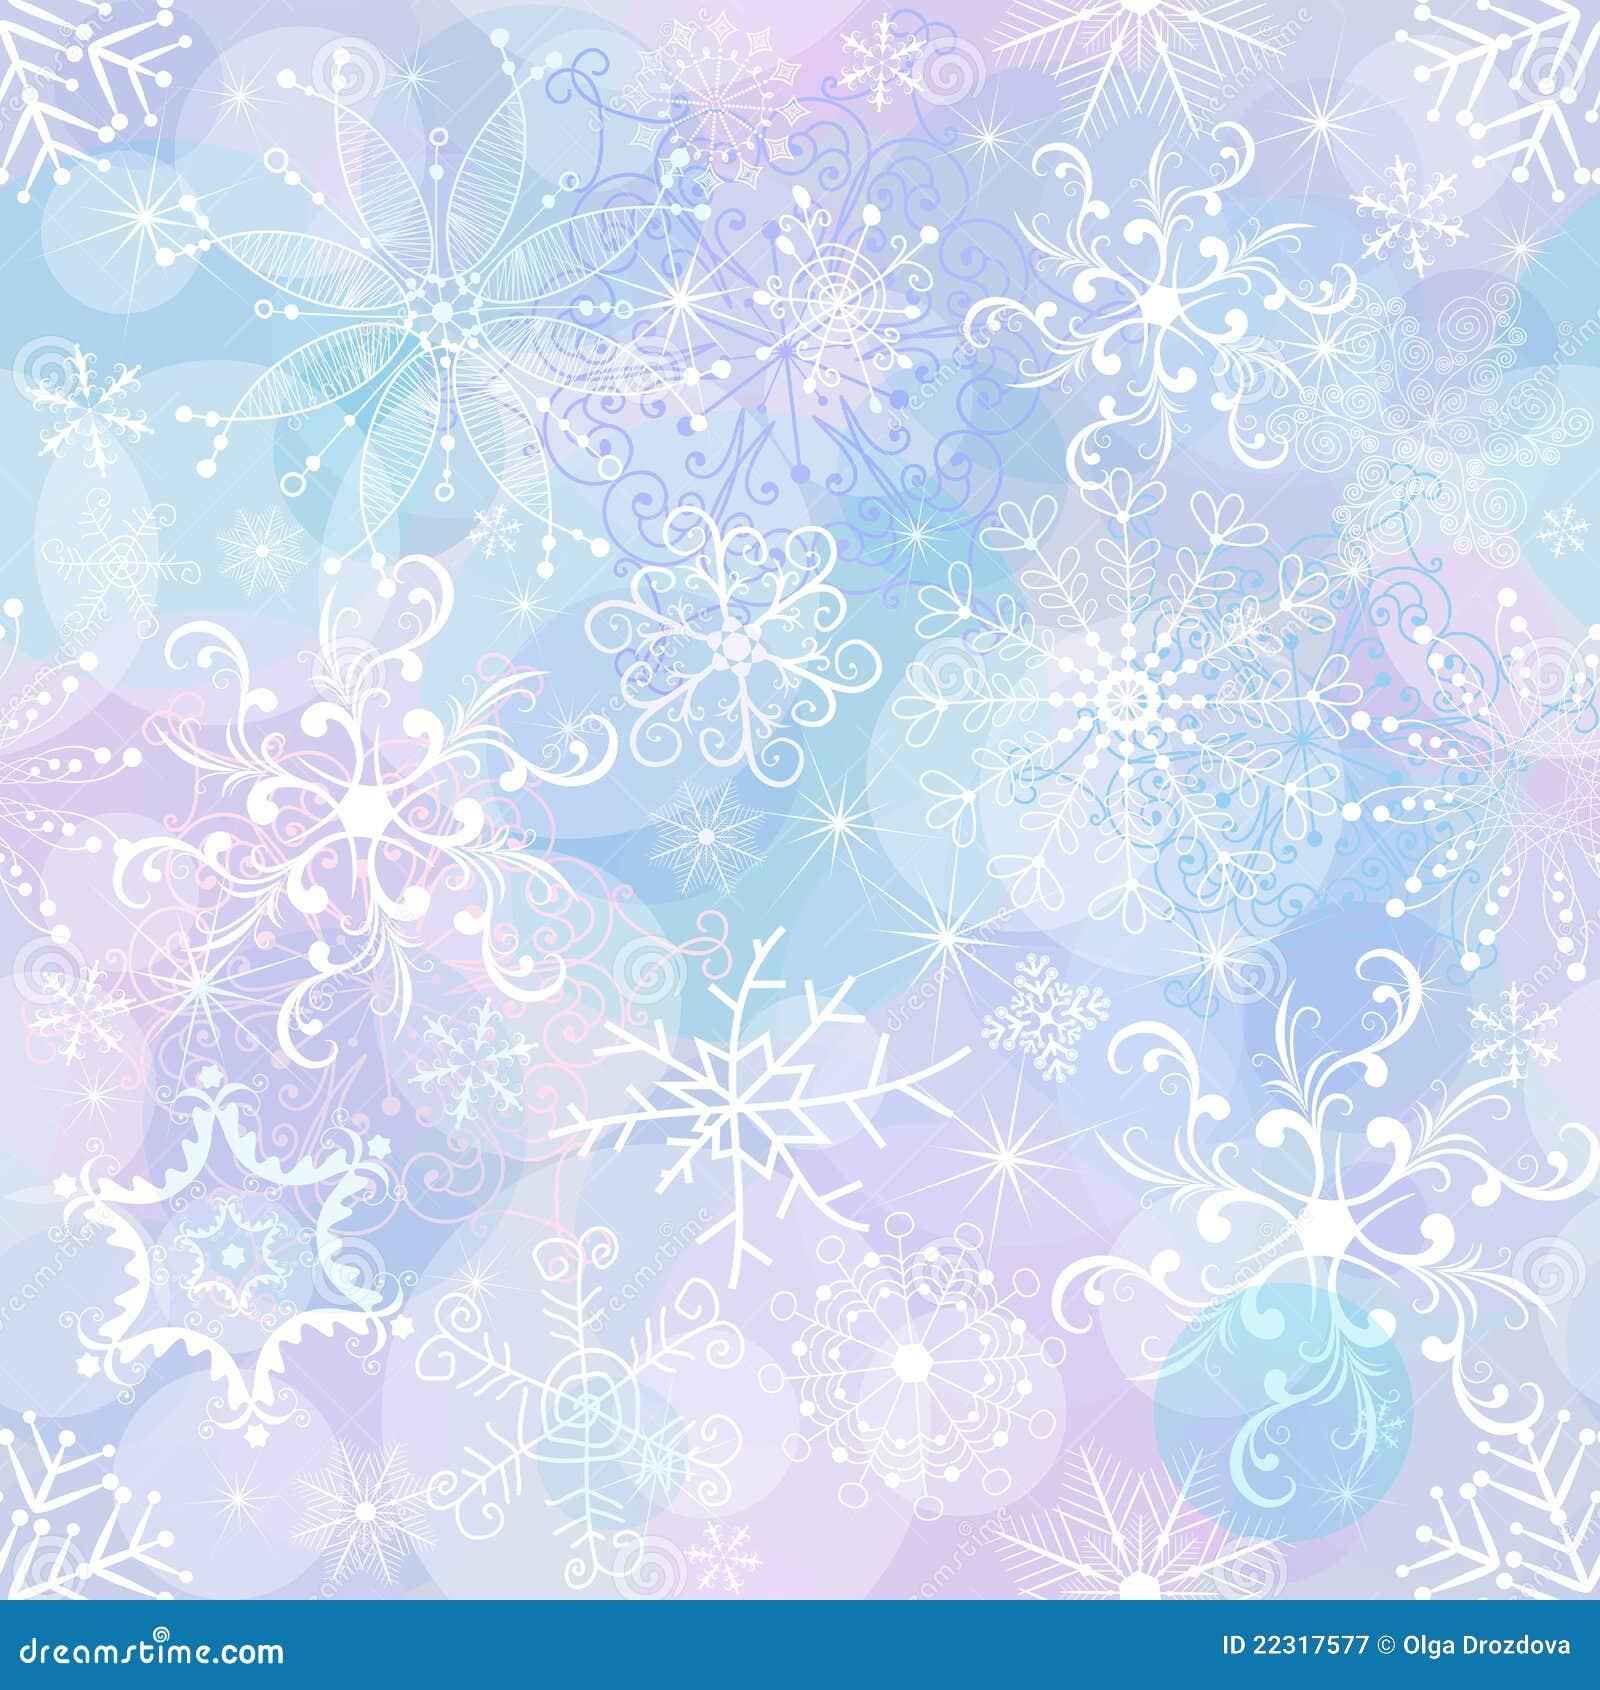 pastel snowflake wallpaper - photo #2